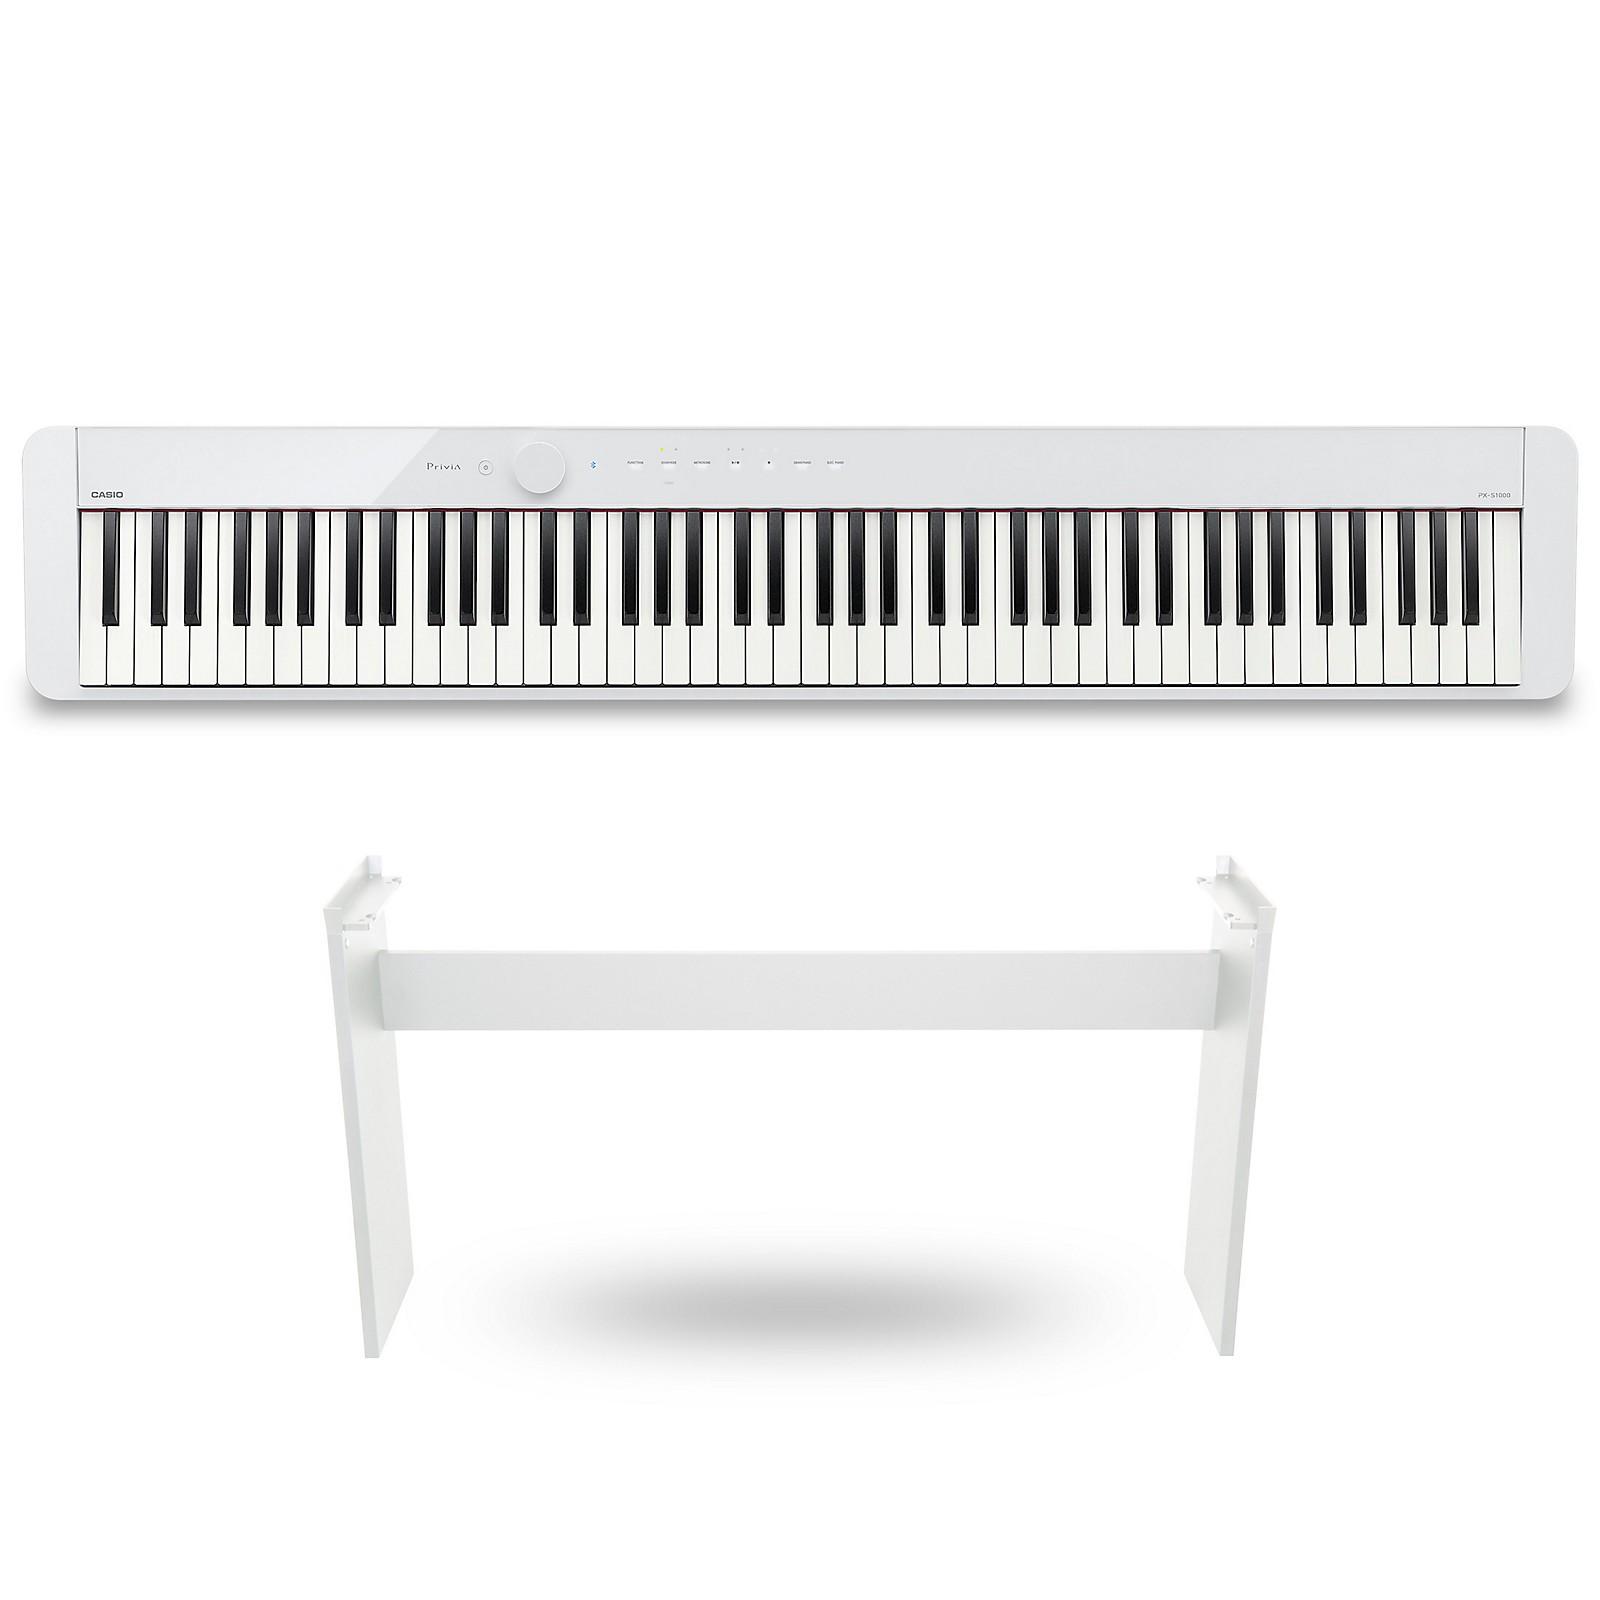 Casio PX-S1000 Privia Digital Piano White With CS68 Stand